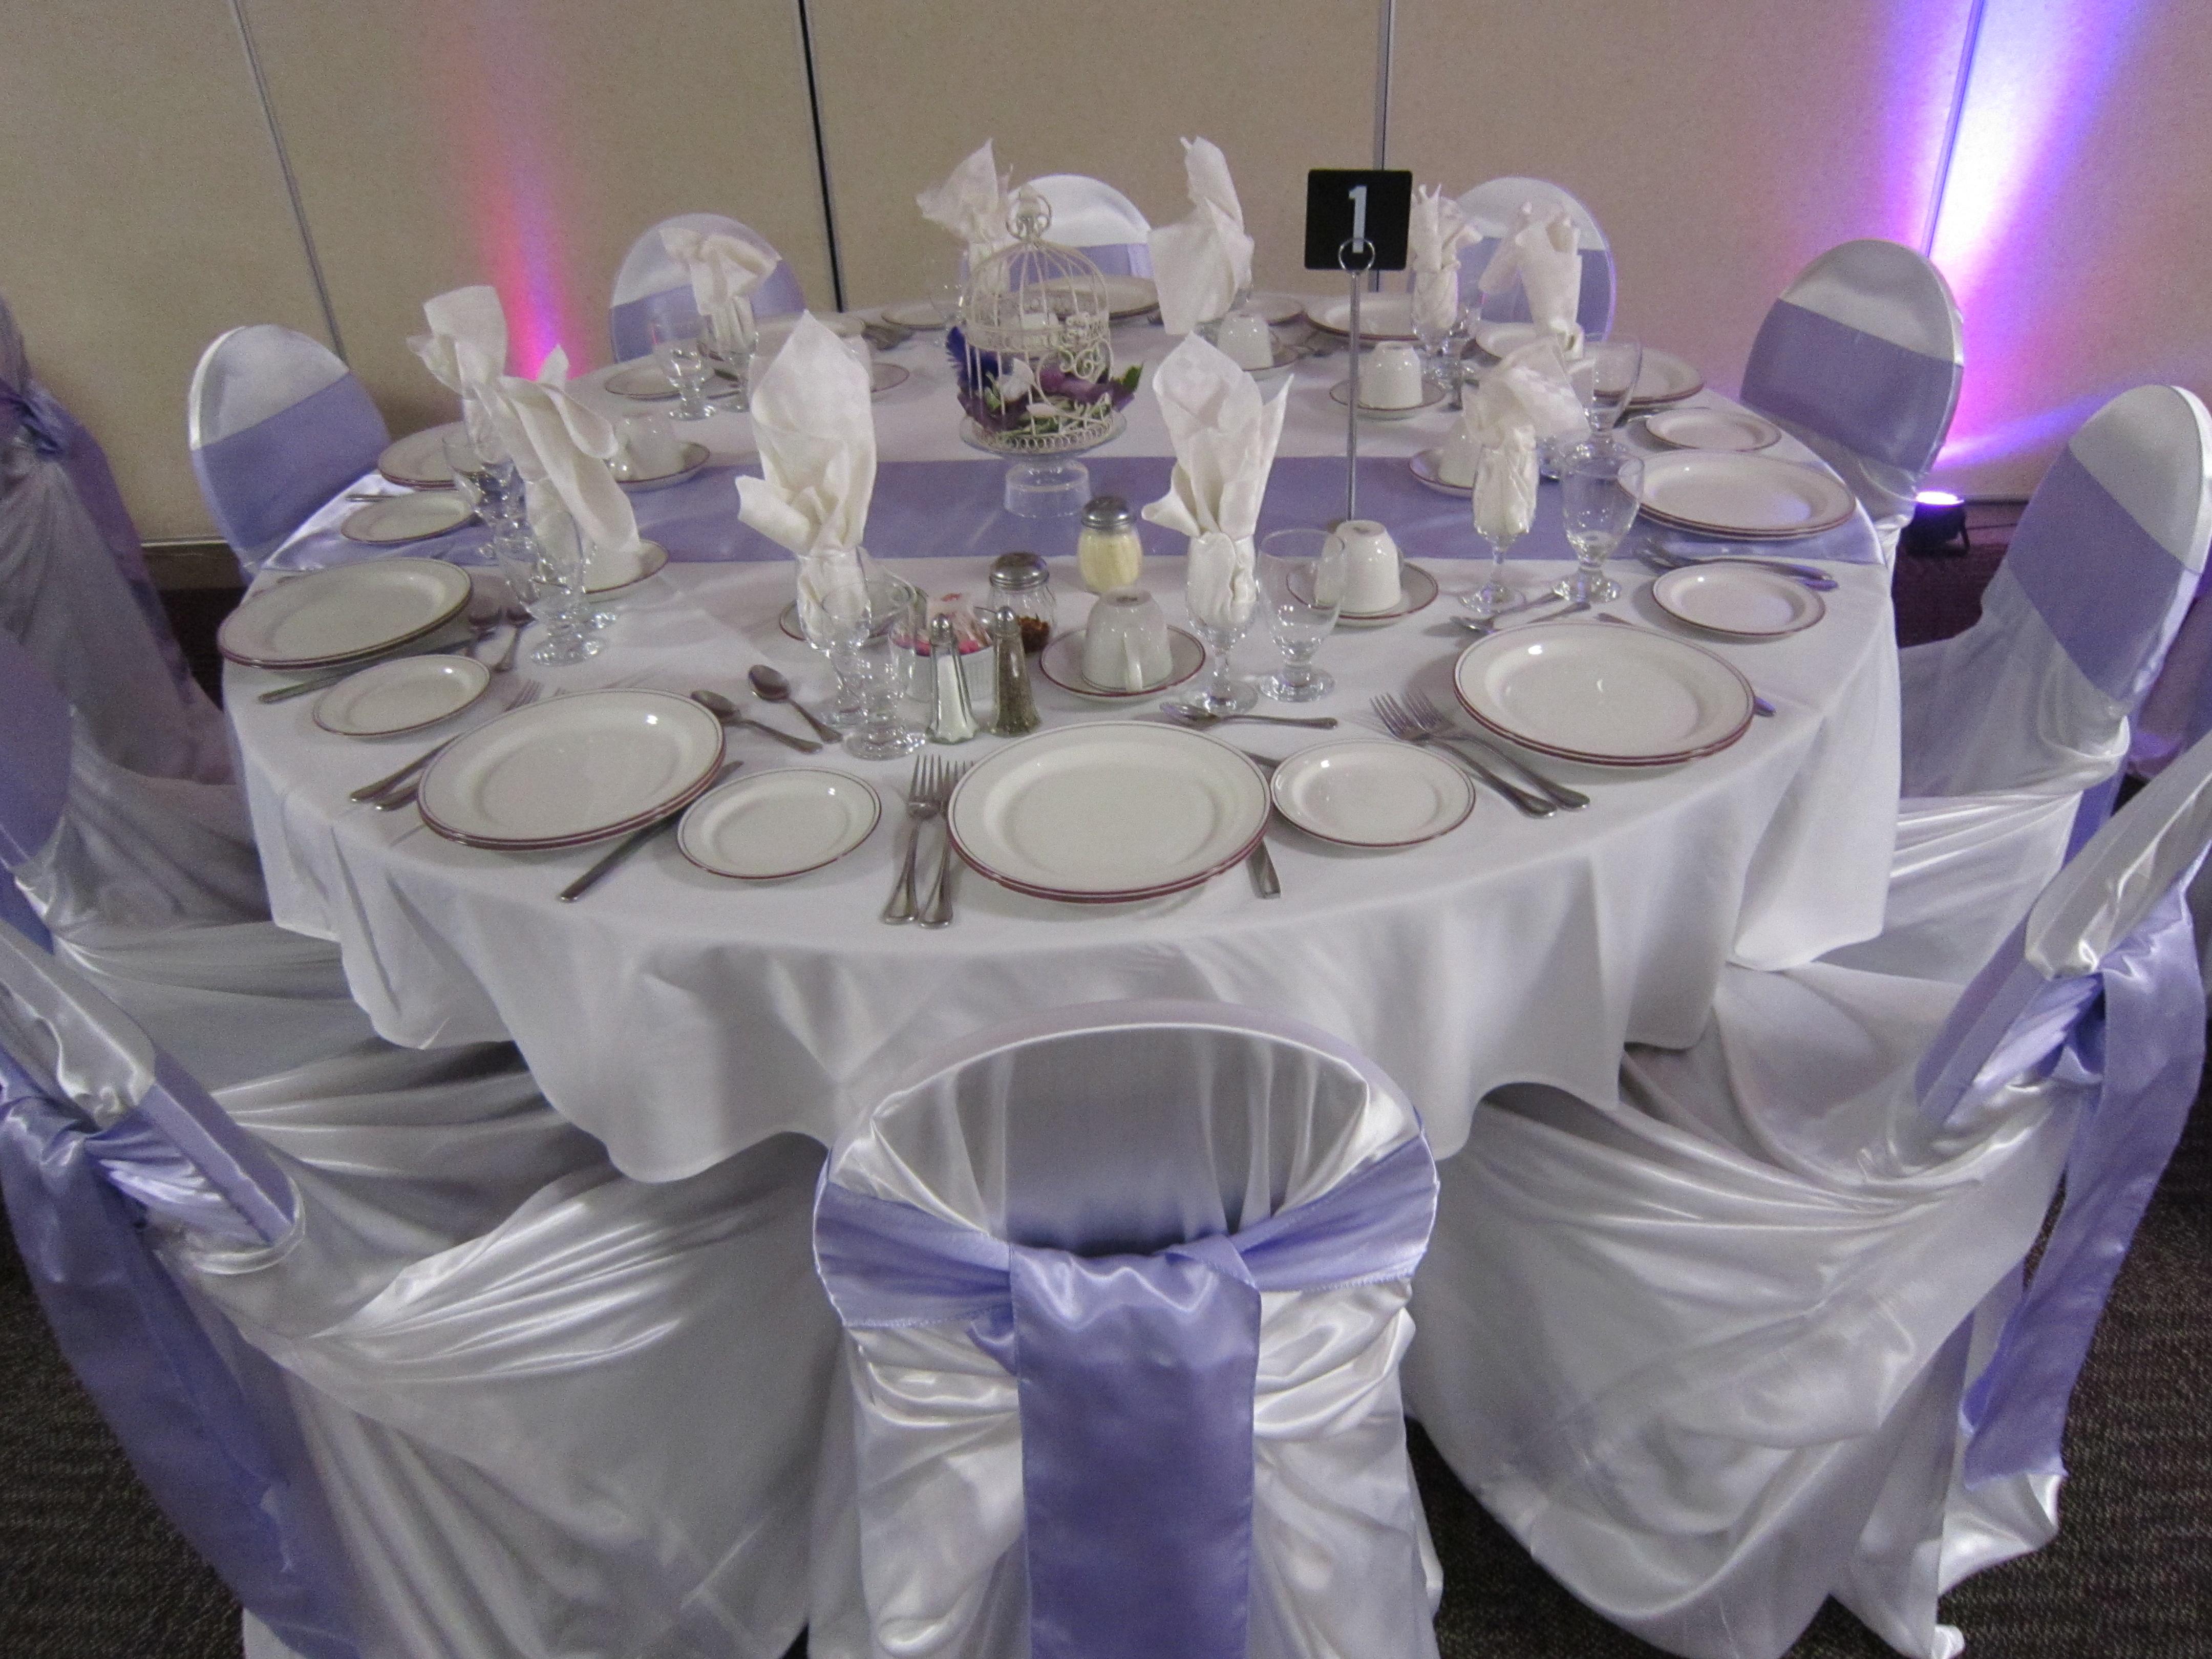 Lavender Club Capri Head Table Draping Niagara Wedding Decor